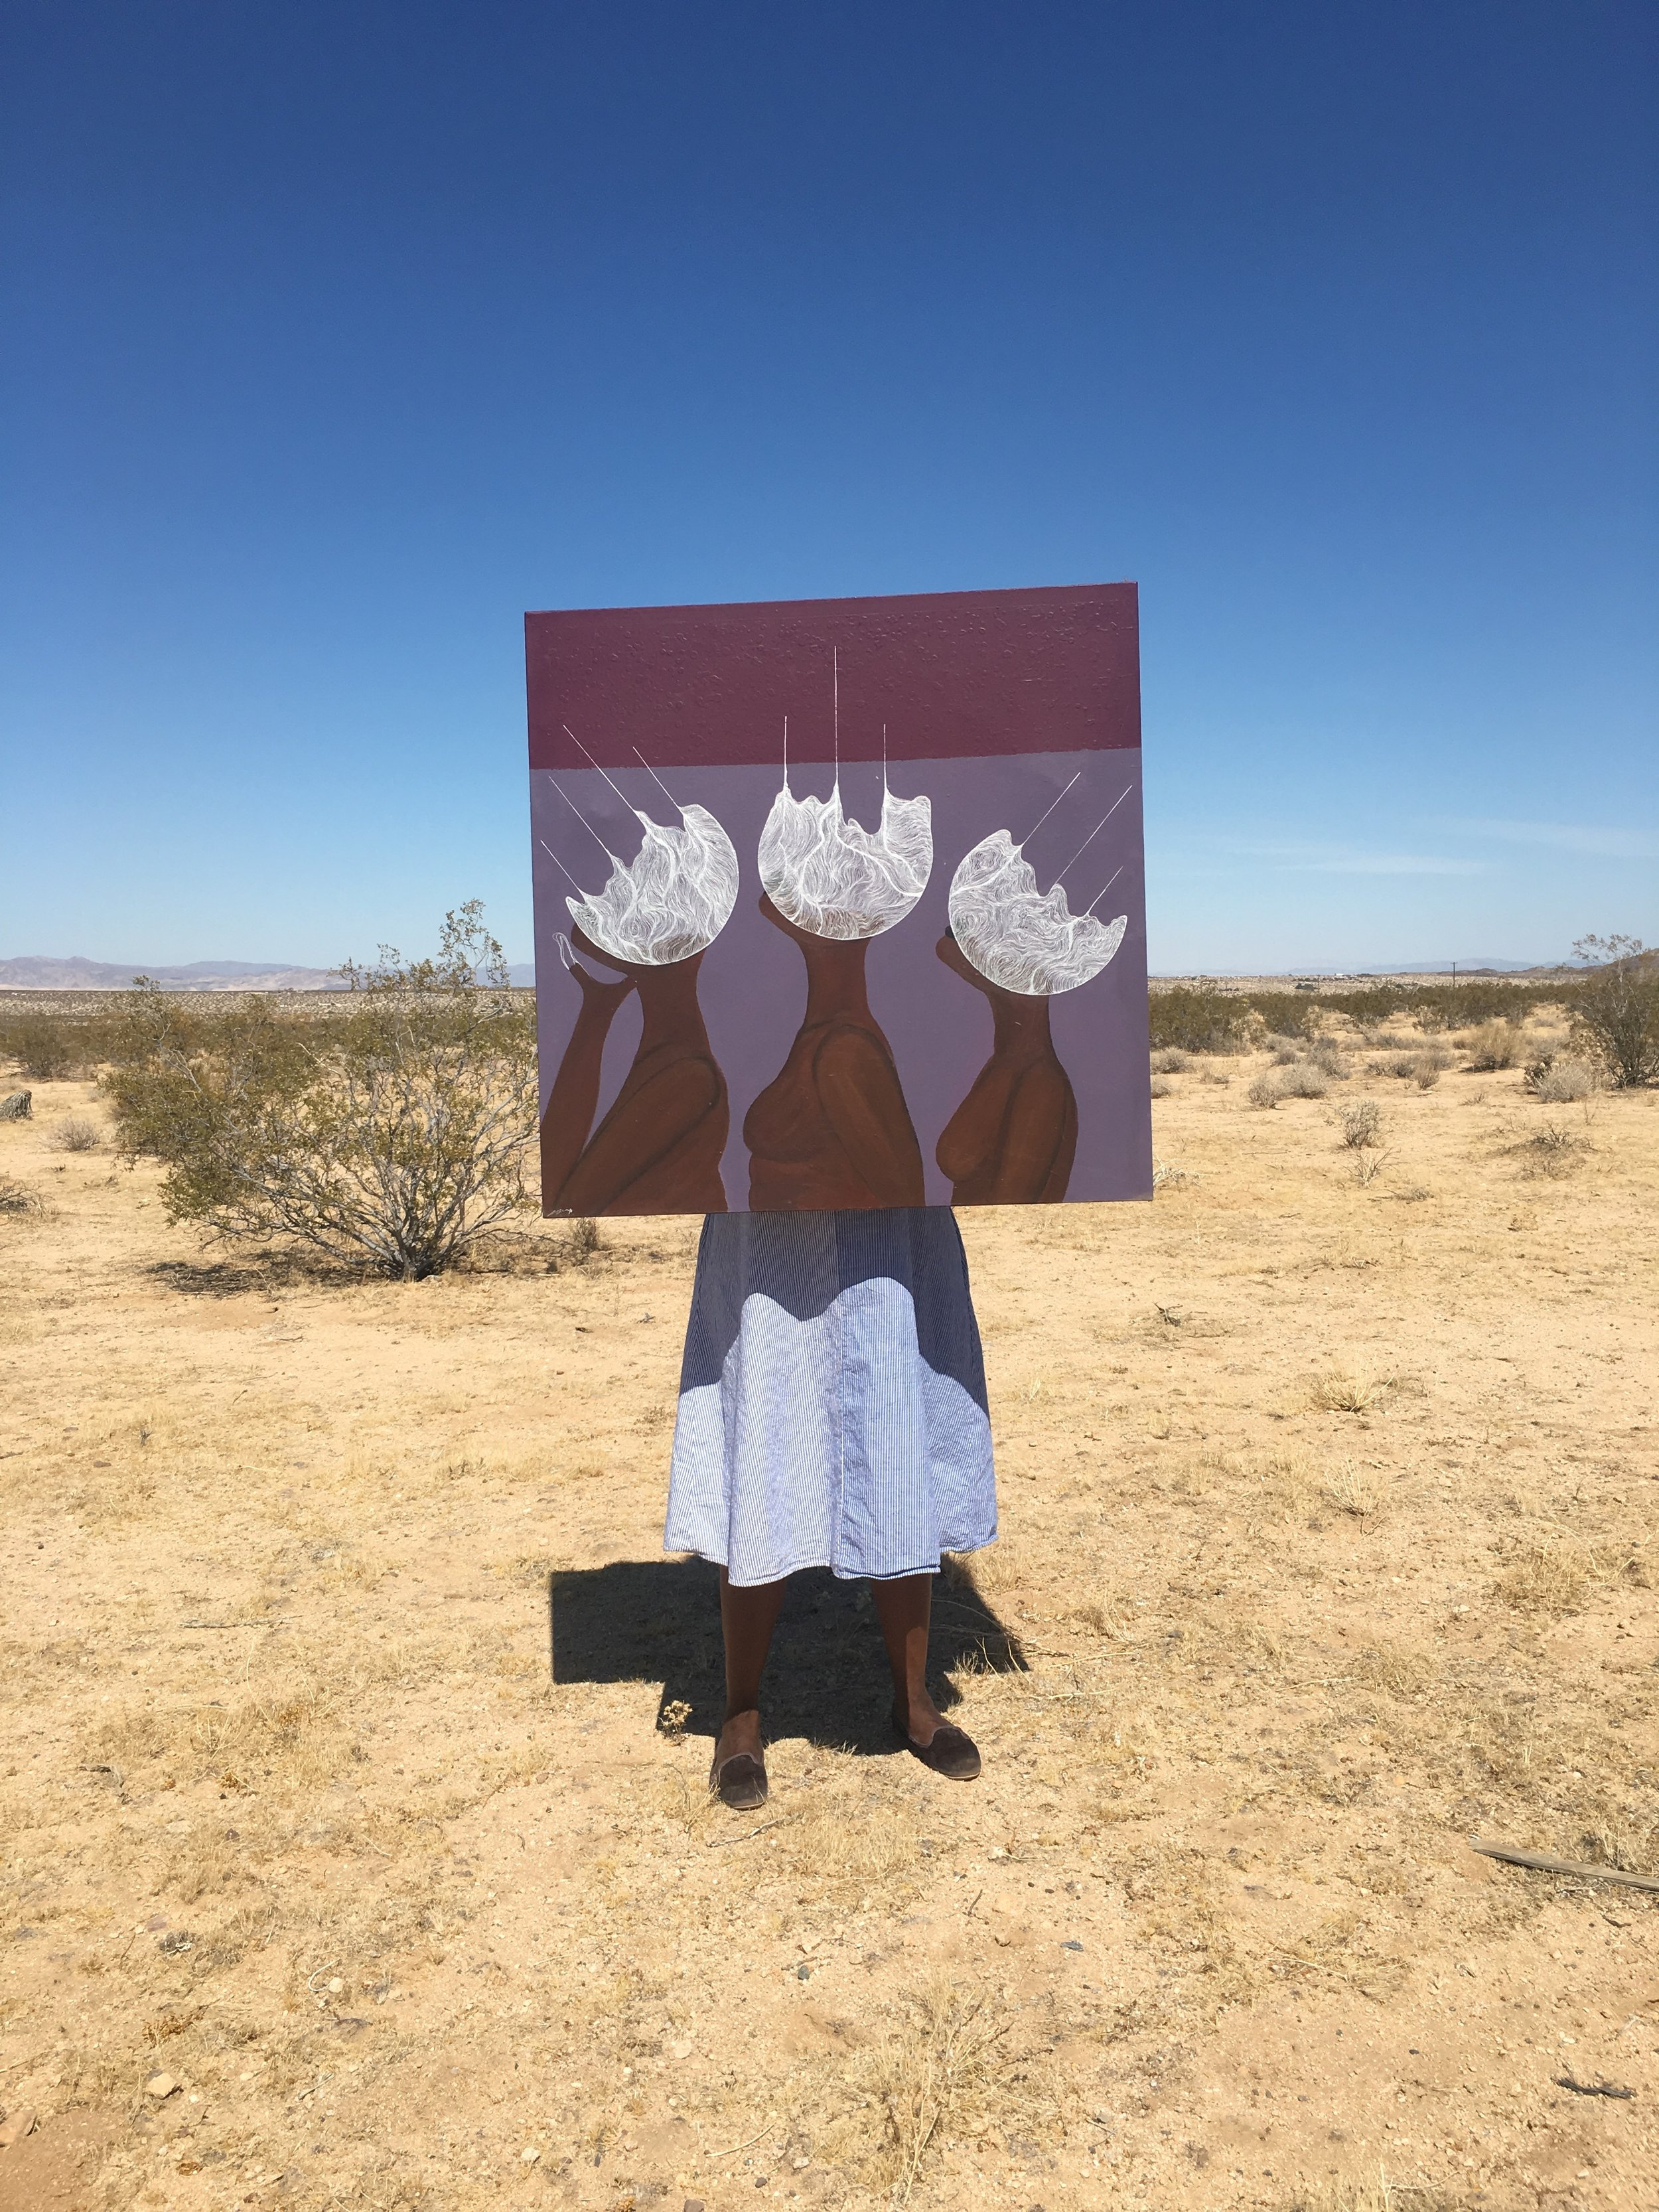 ART - COMING SOON